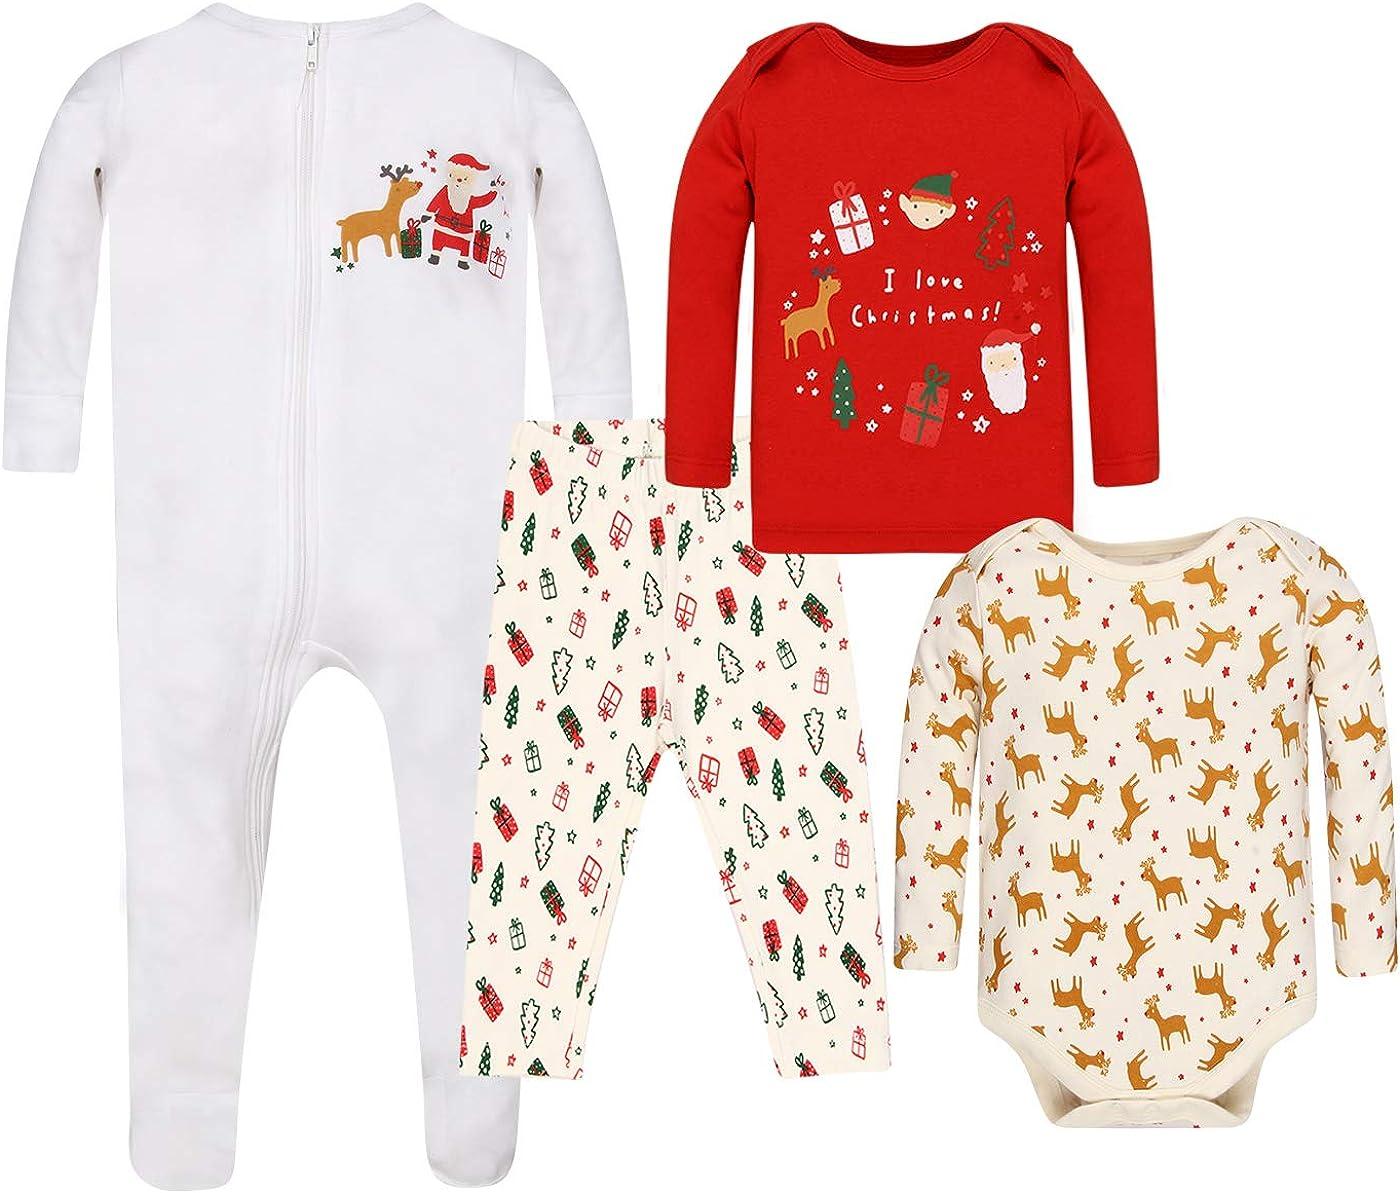 WINK & BLINk Christmas 100% Organic Cotton Baby Sleep N' Play, Bodysuit and Top+Bottom Pajama Sleeper Set